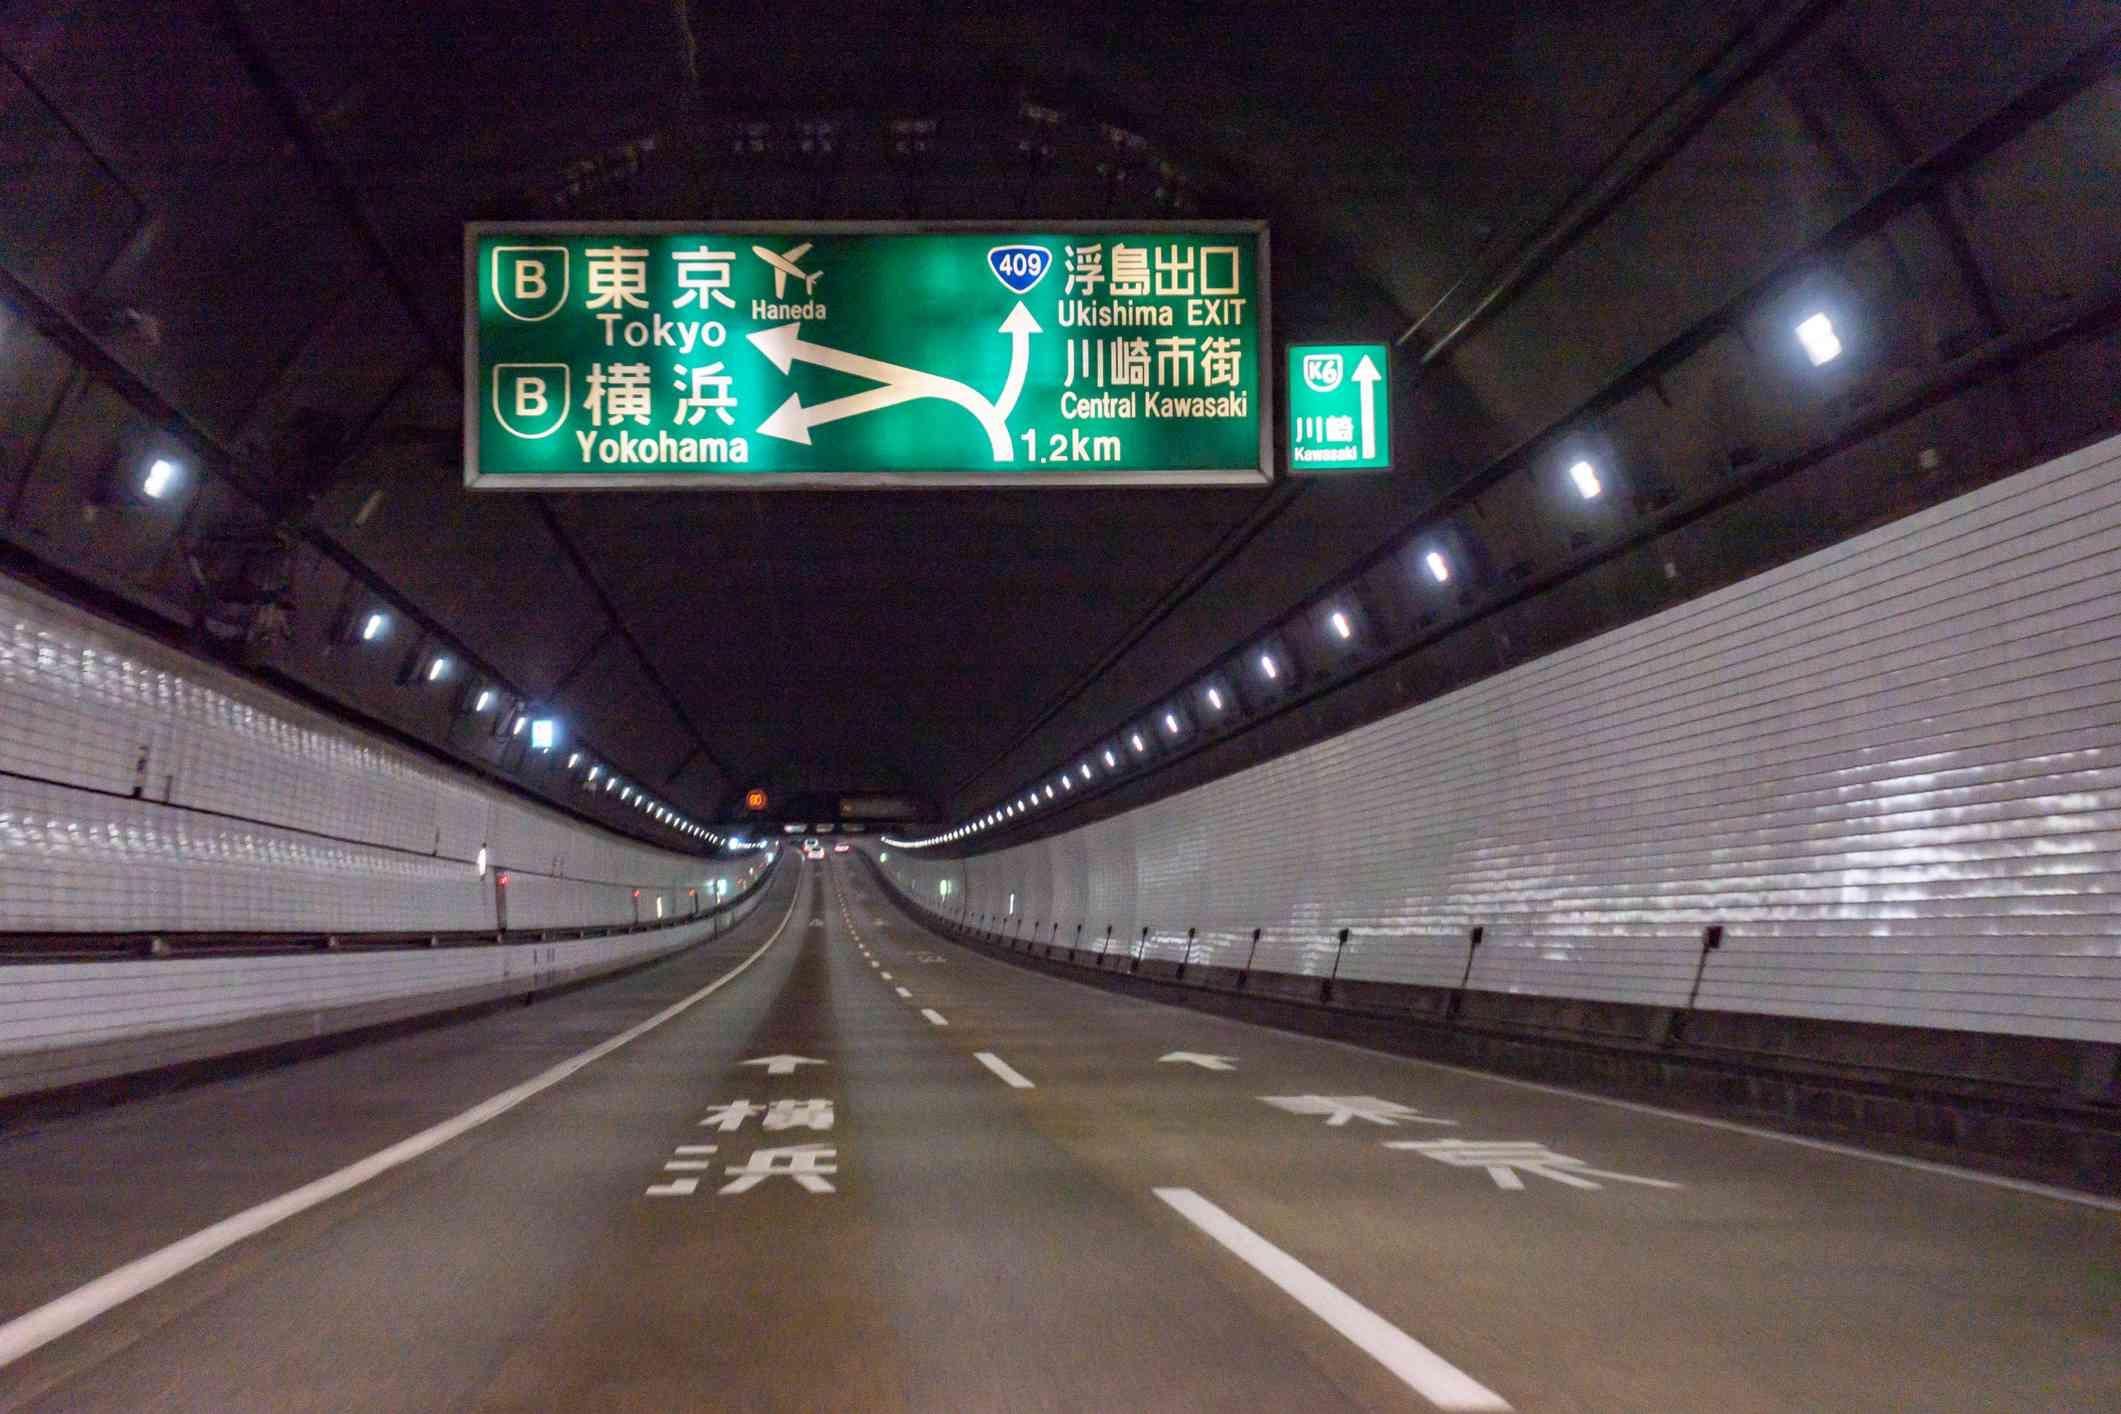 Image of section of Tokyo Bay Aqua Line in Kawasaki city of Japan